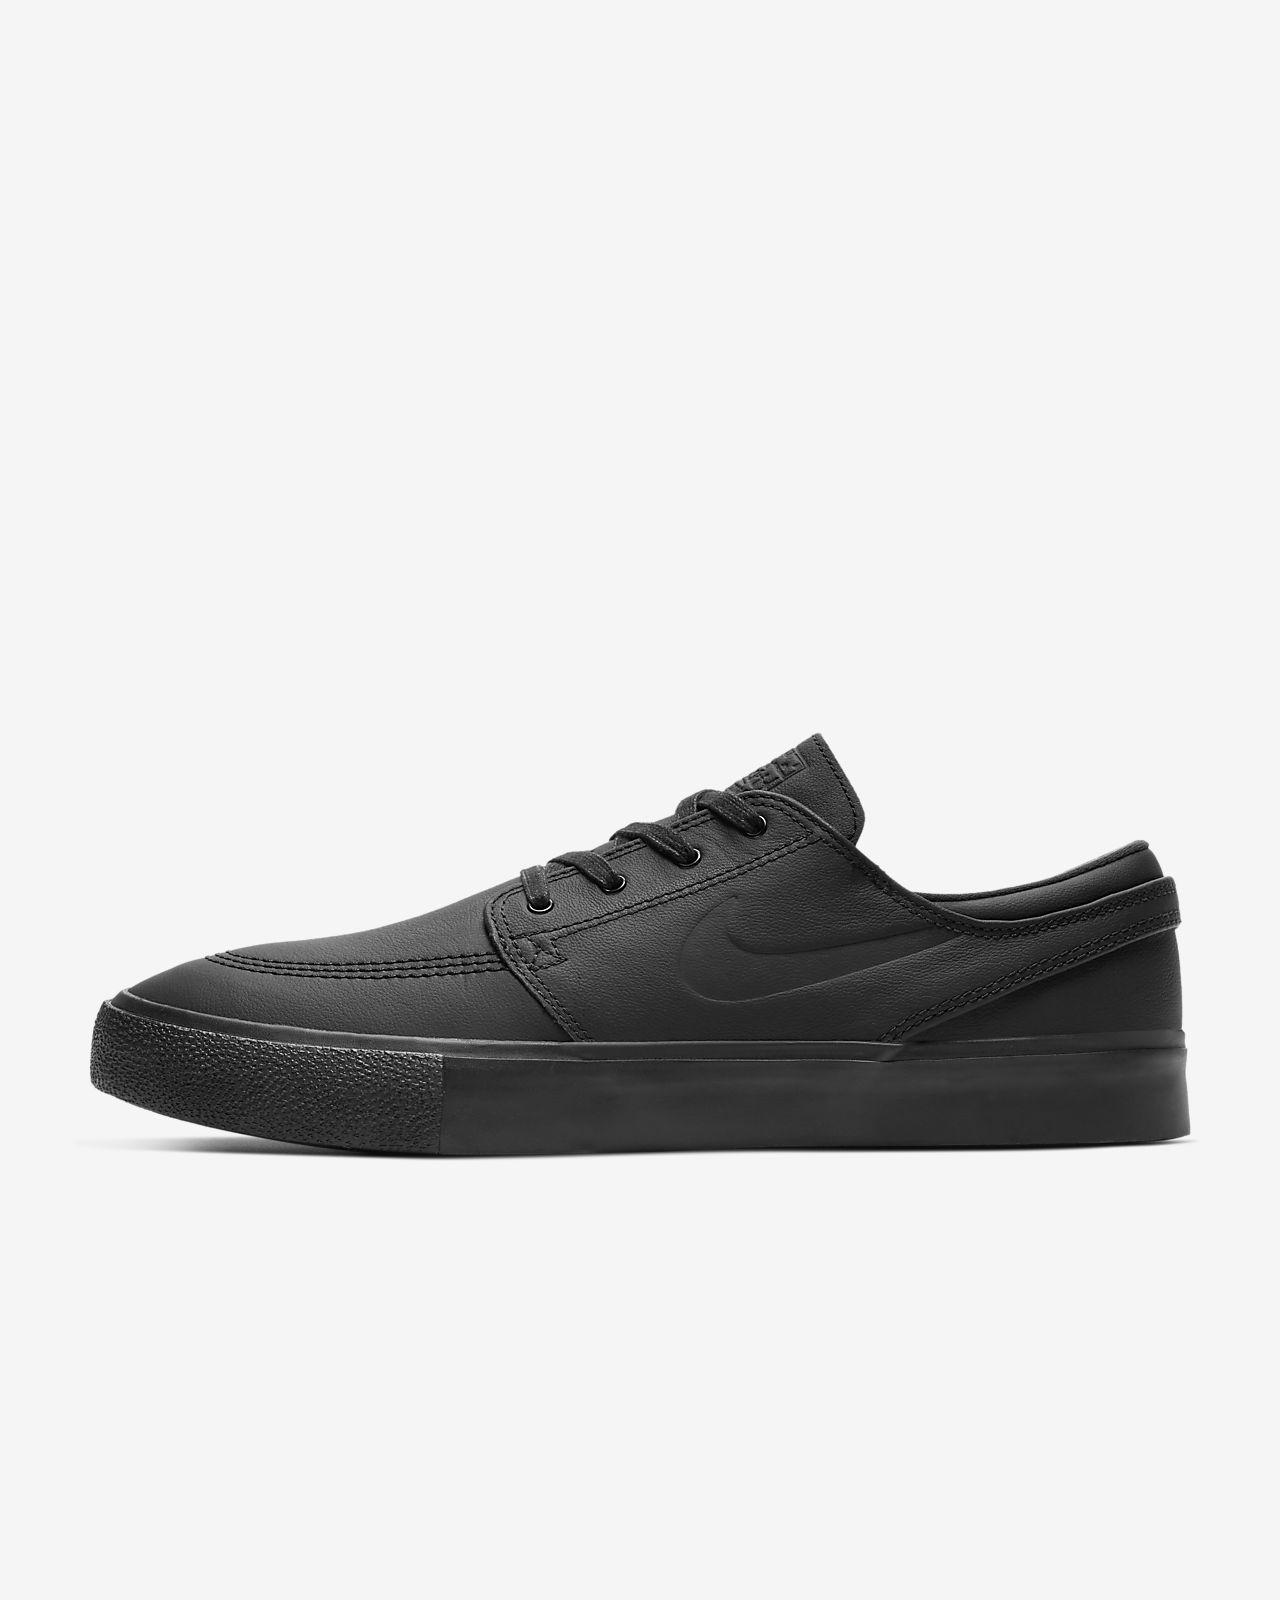 nike skate shoes janoski